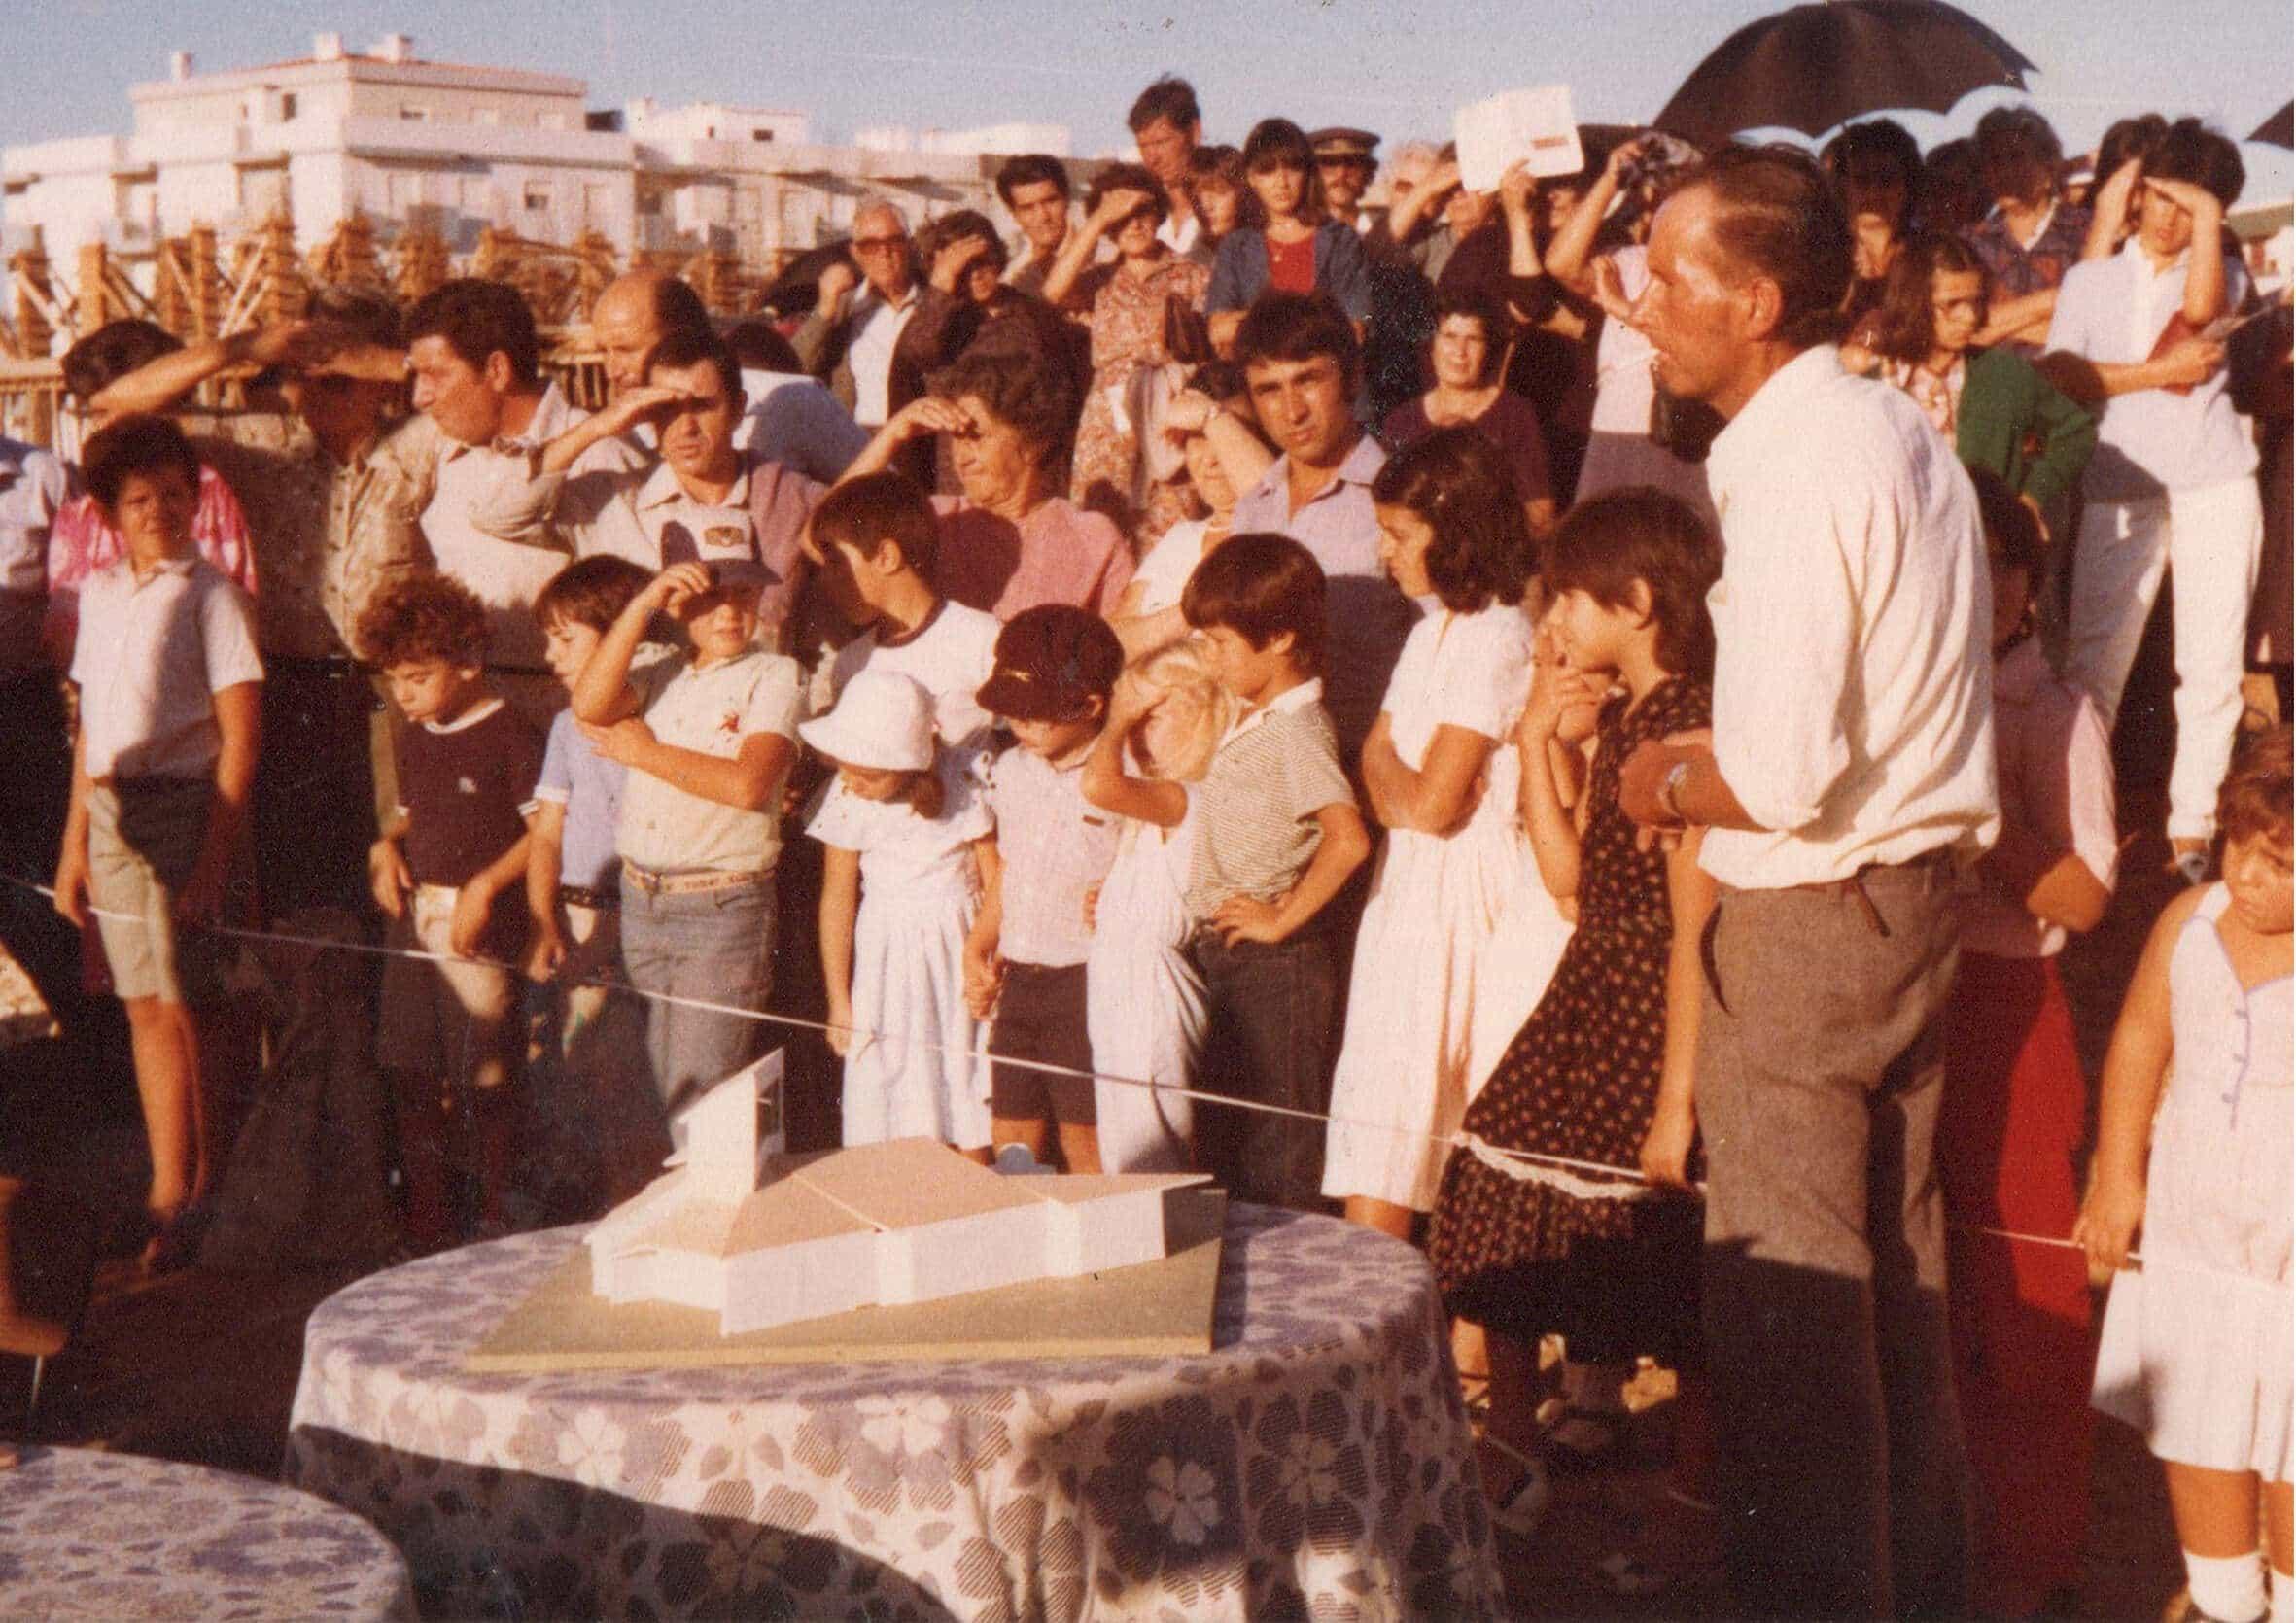 historia-1o-pedra-da-igreja-11-out-1981-copia